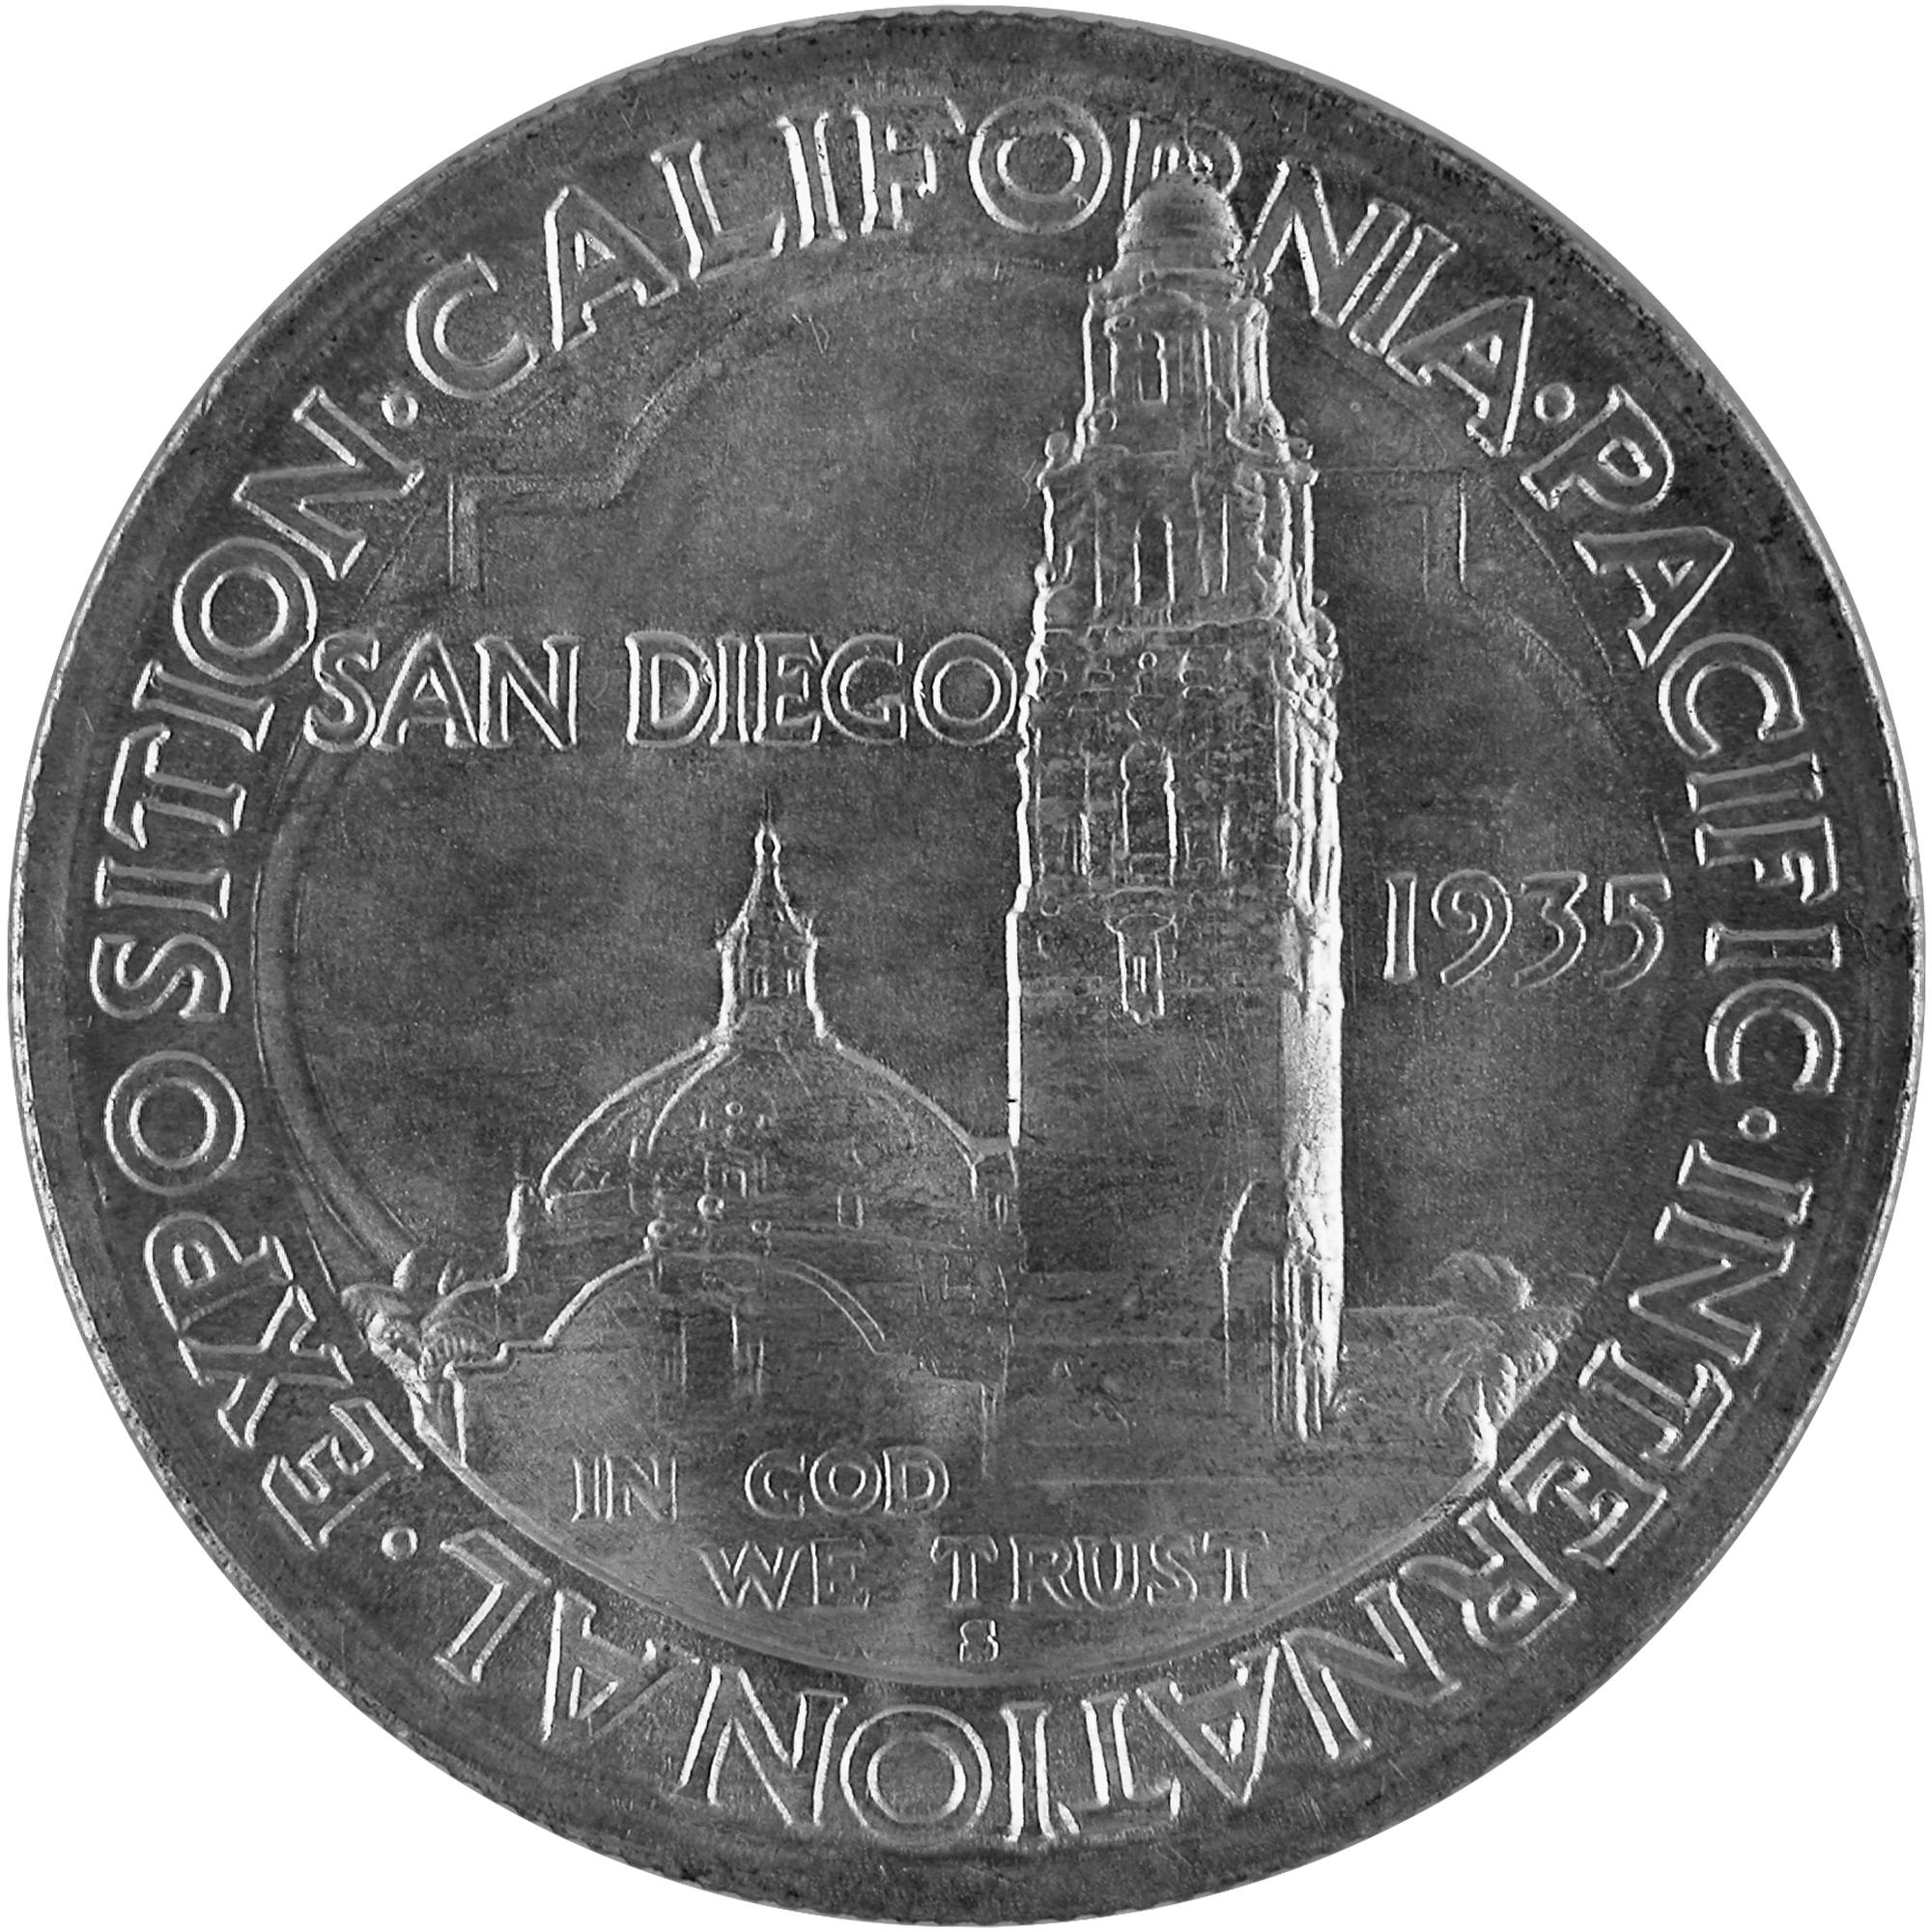 1935 San Diego California Pacific Exposition Commemorative Silver Half Dollar Coin Reverse